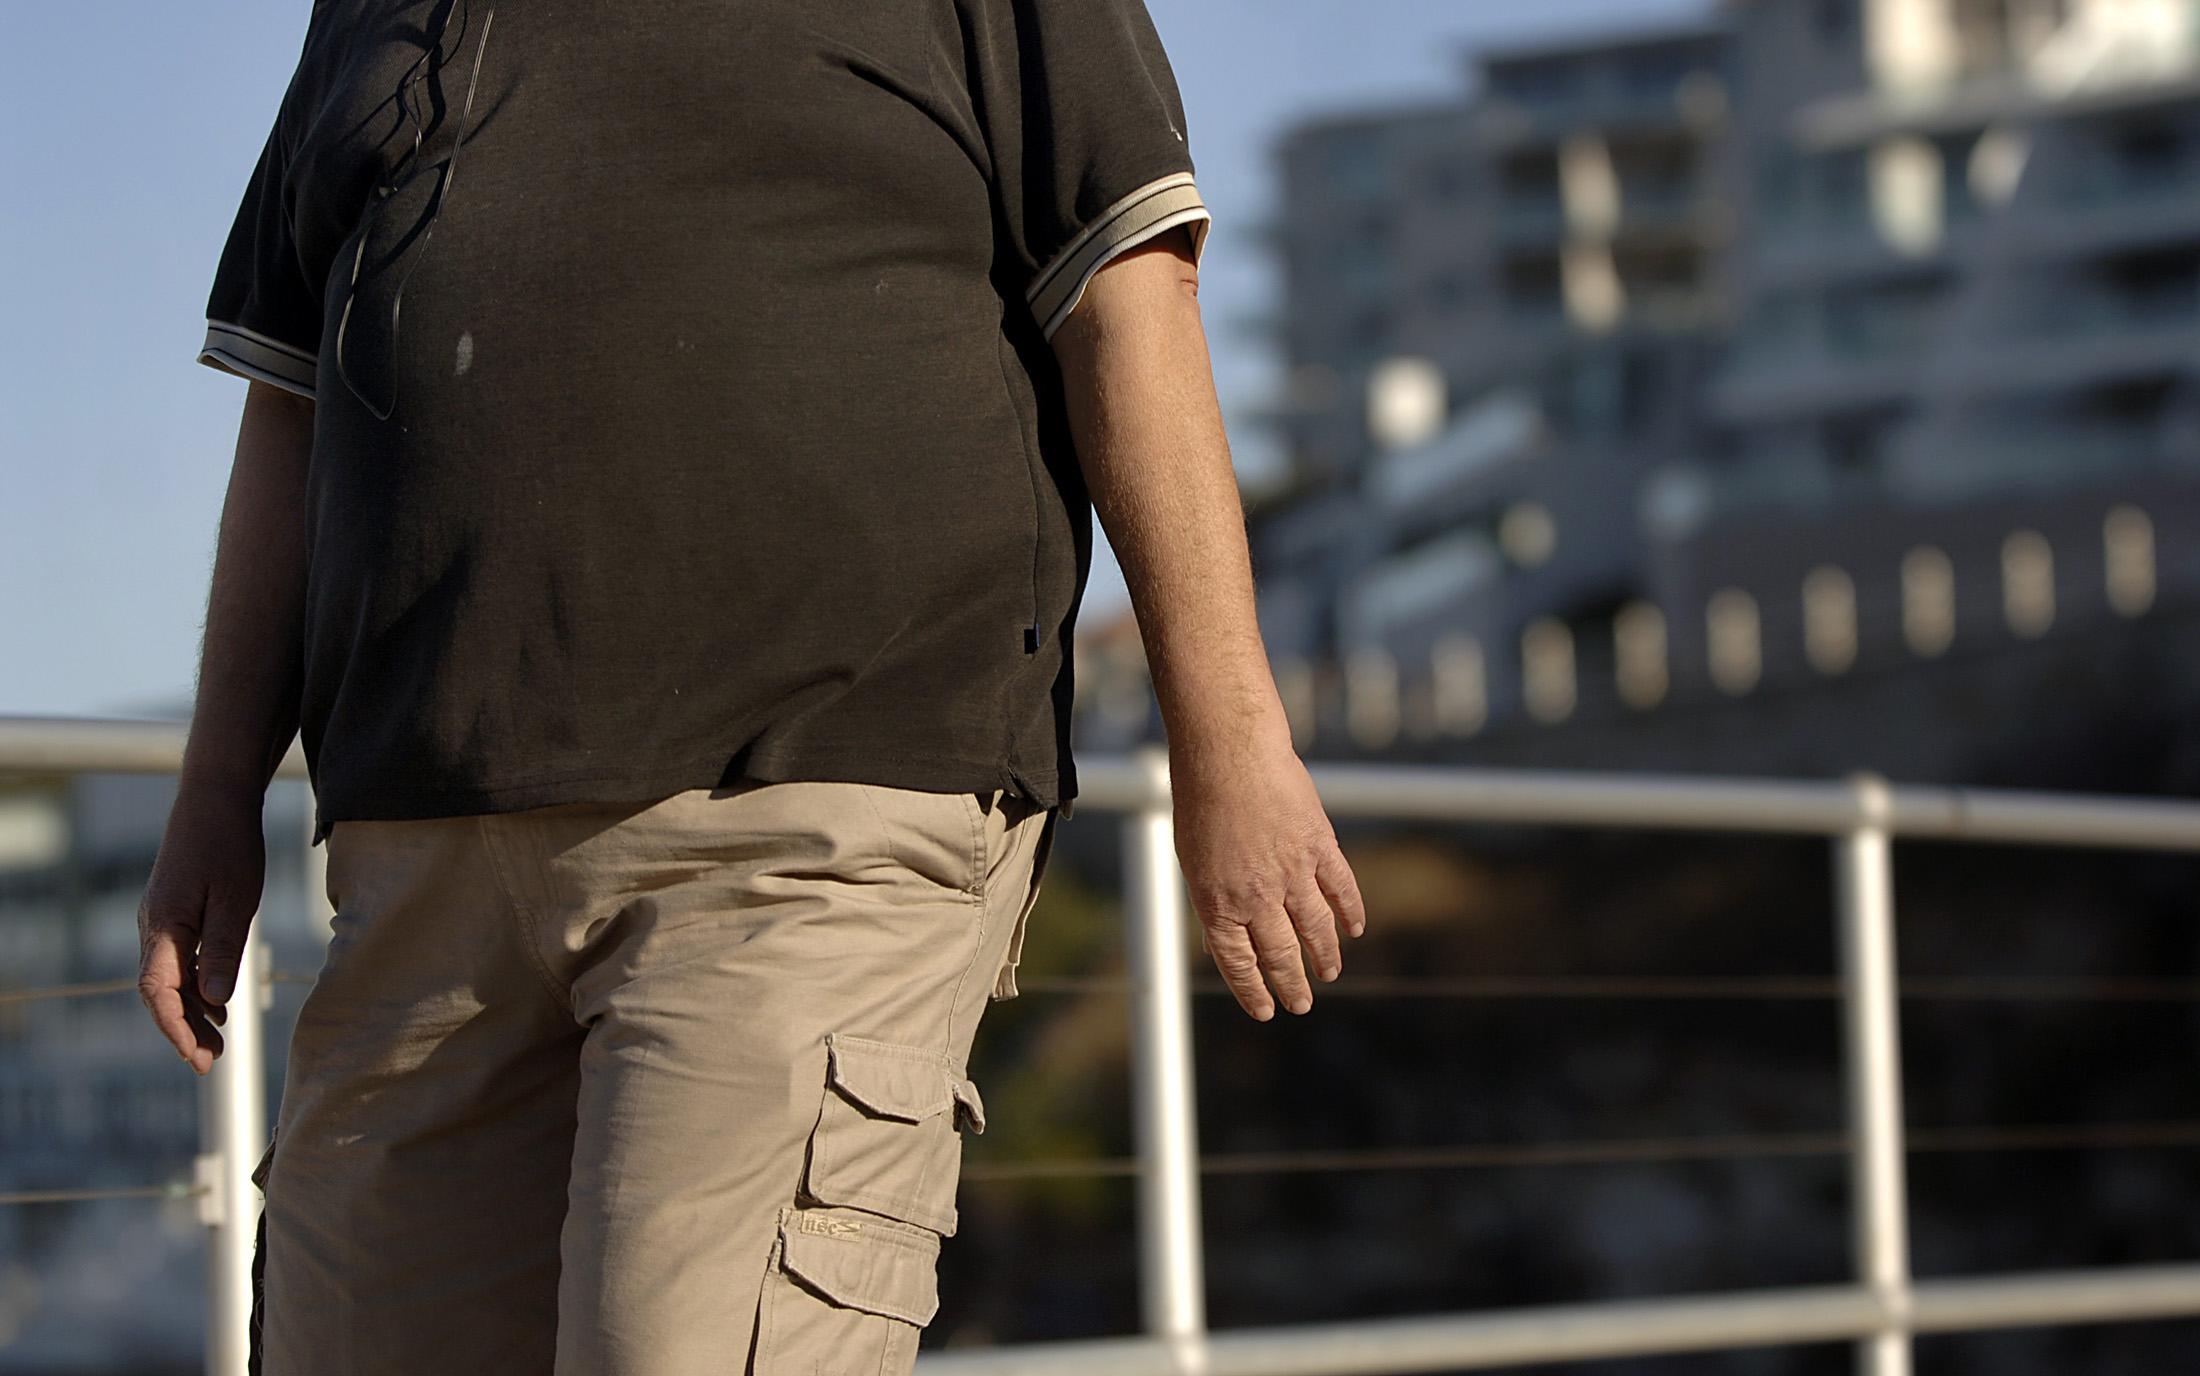 https://assets.sourcemedia.com/a0/c8/88a997f84d2582d9c209fe7b5200/bloomberg-obesity.jpg